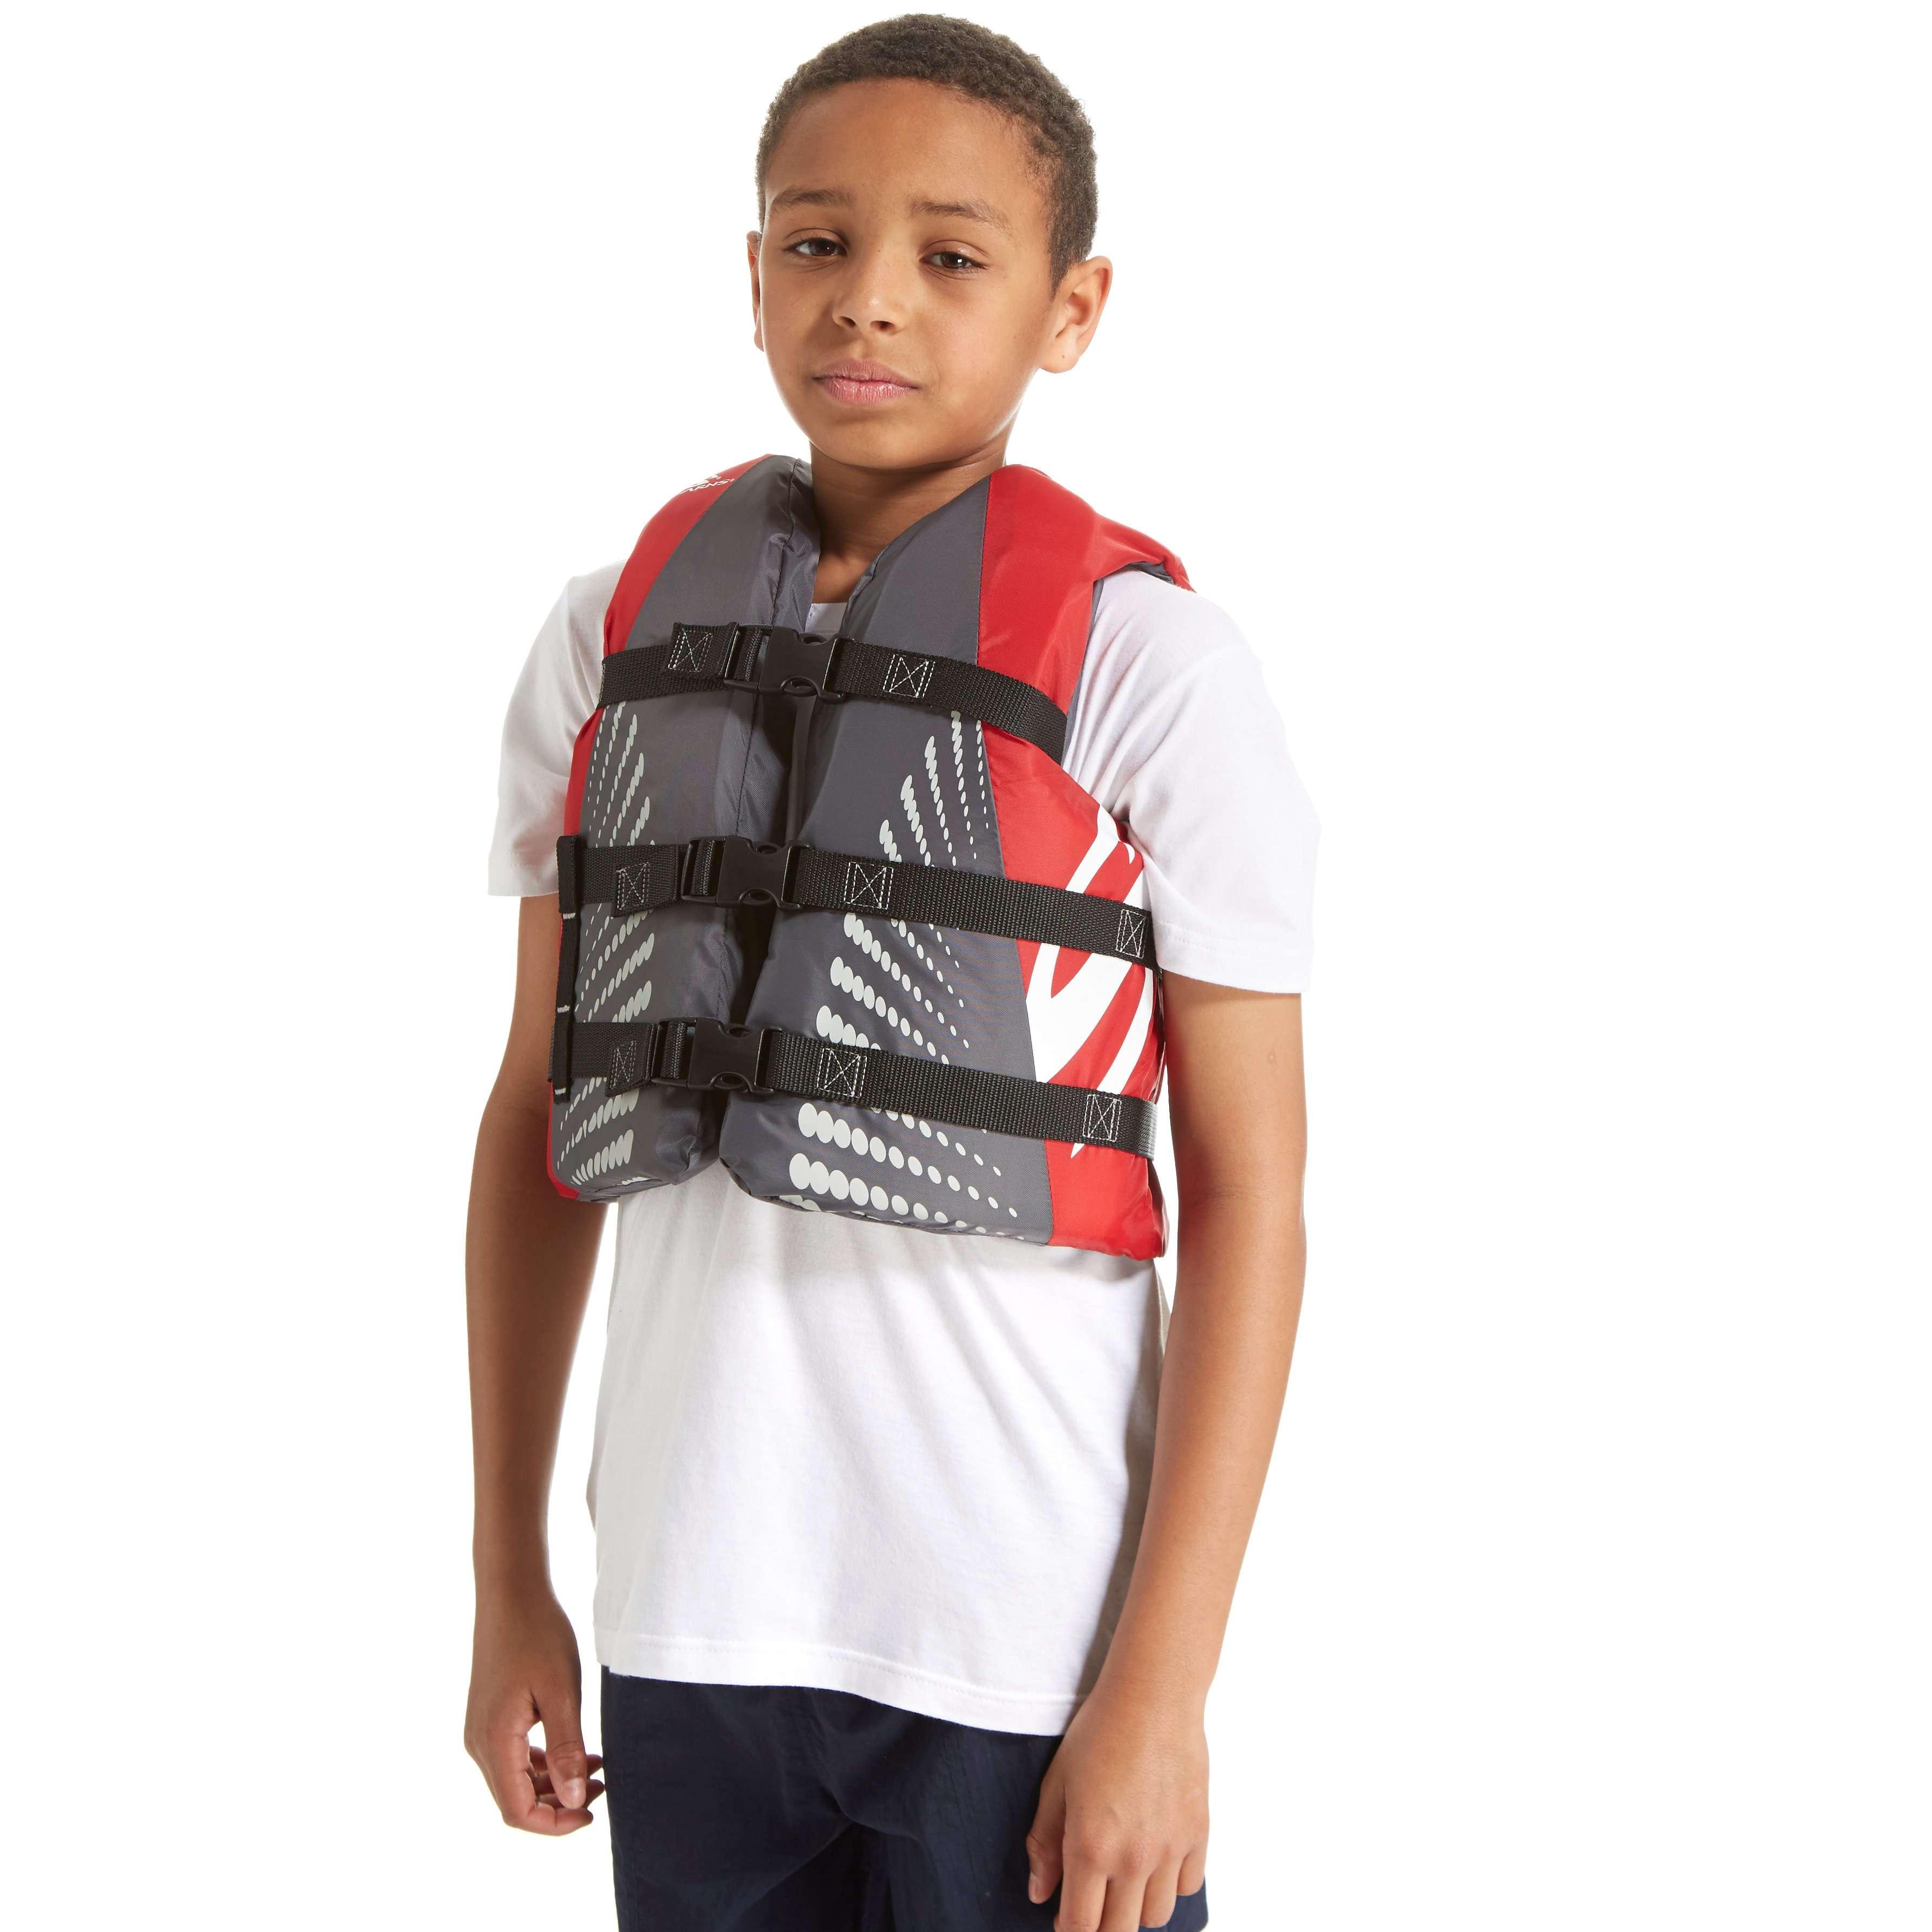 STEARNS Classic Mass Kids' Life Vest